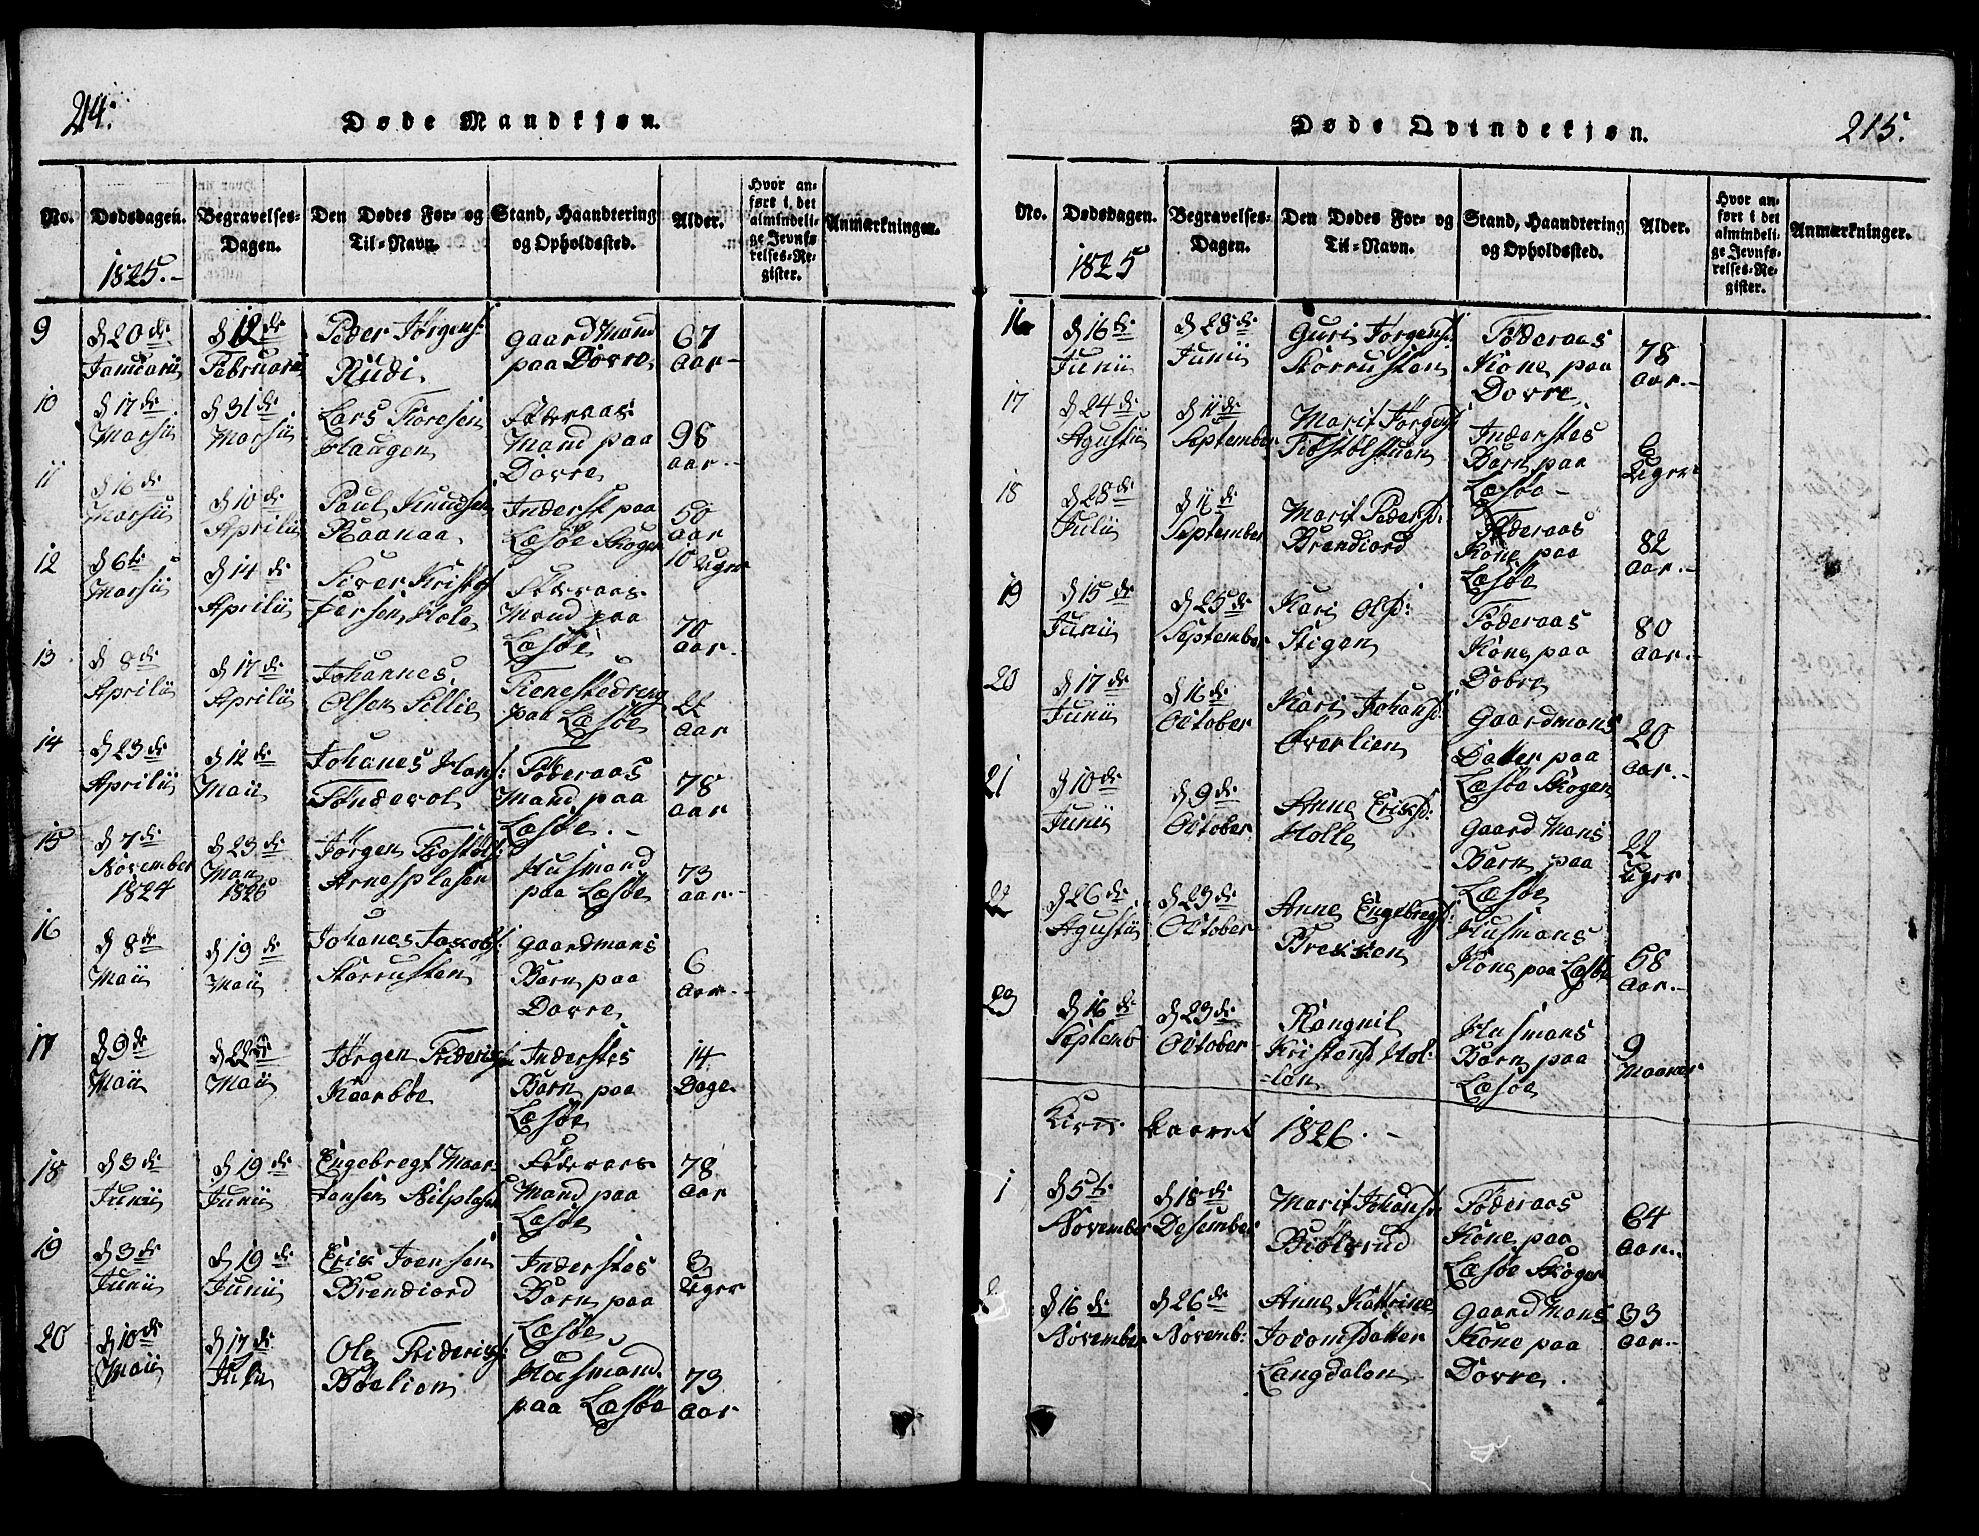 SAH, Lesja prestekontor, Klokkerbok nr. 1, 1820-1831, s. 214-215